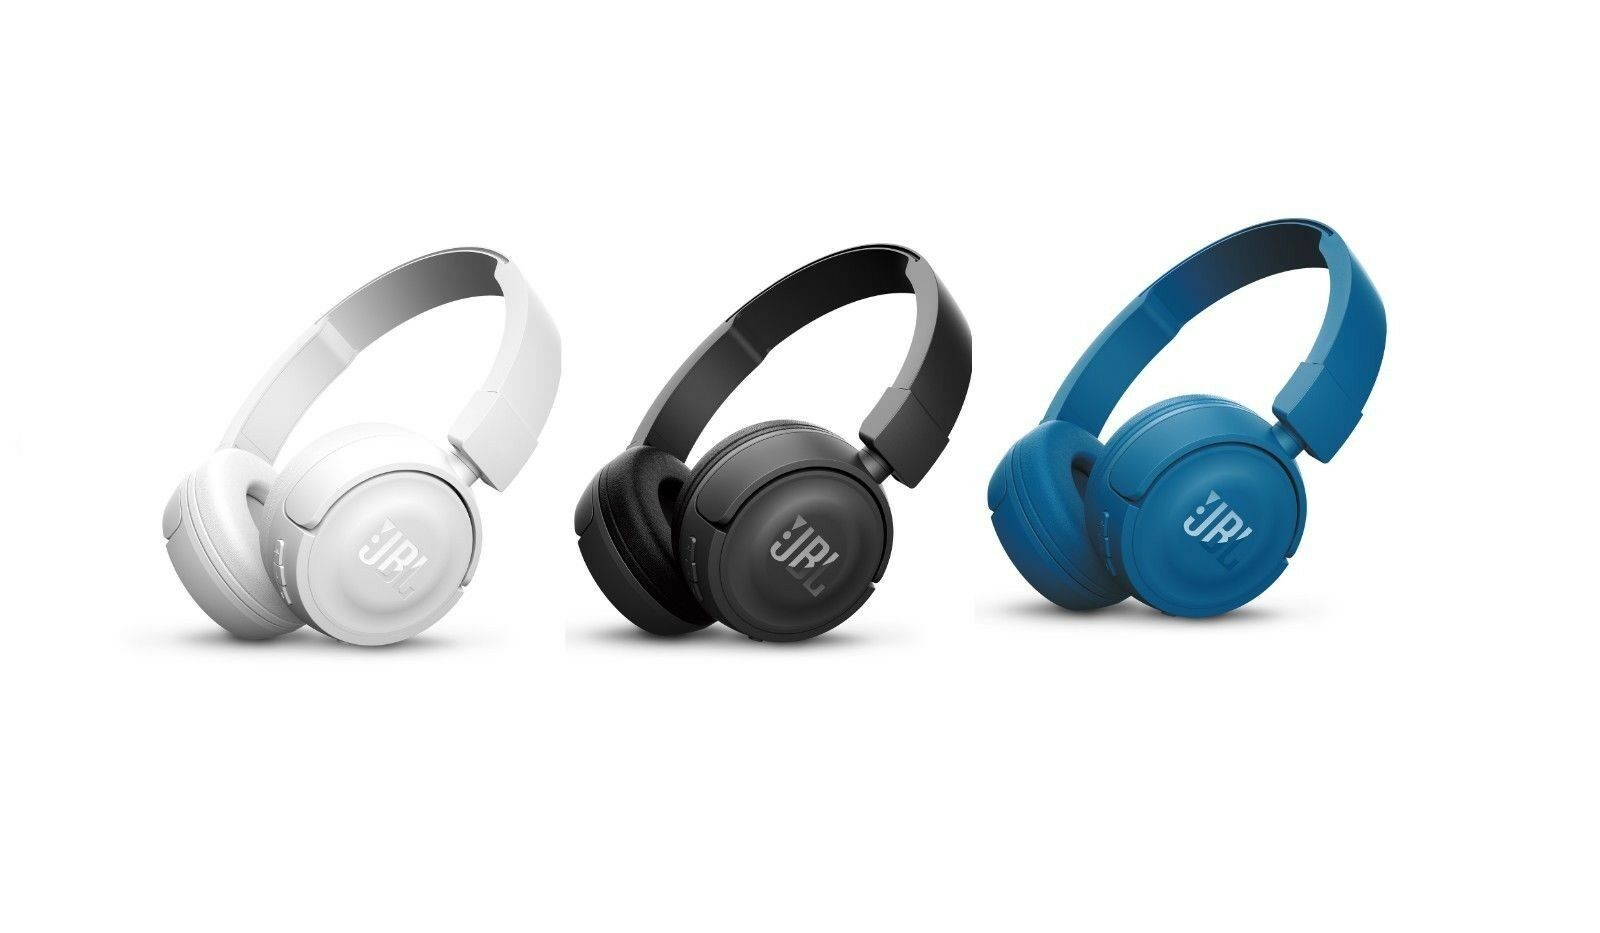 On Ear Headphones Wireless Headphones Wireless Headphonesbiz